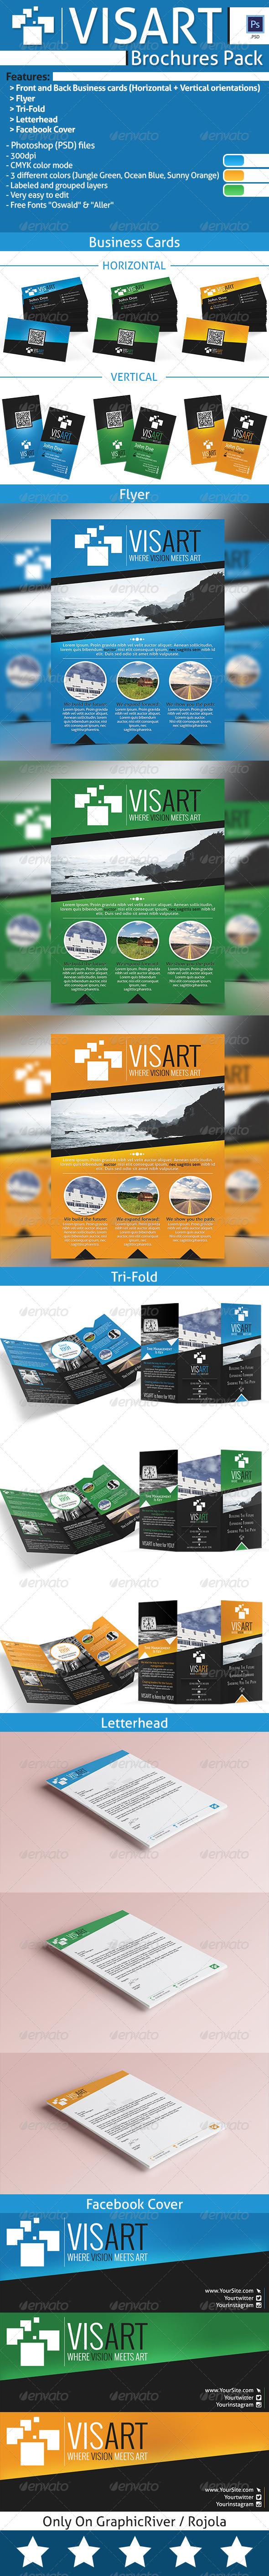 VISART Brochures Pack Templates